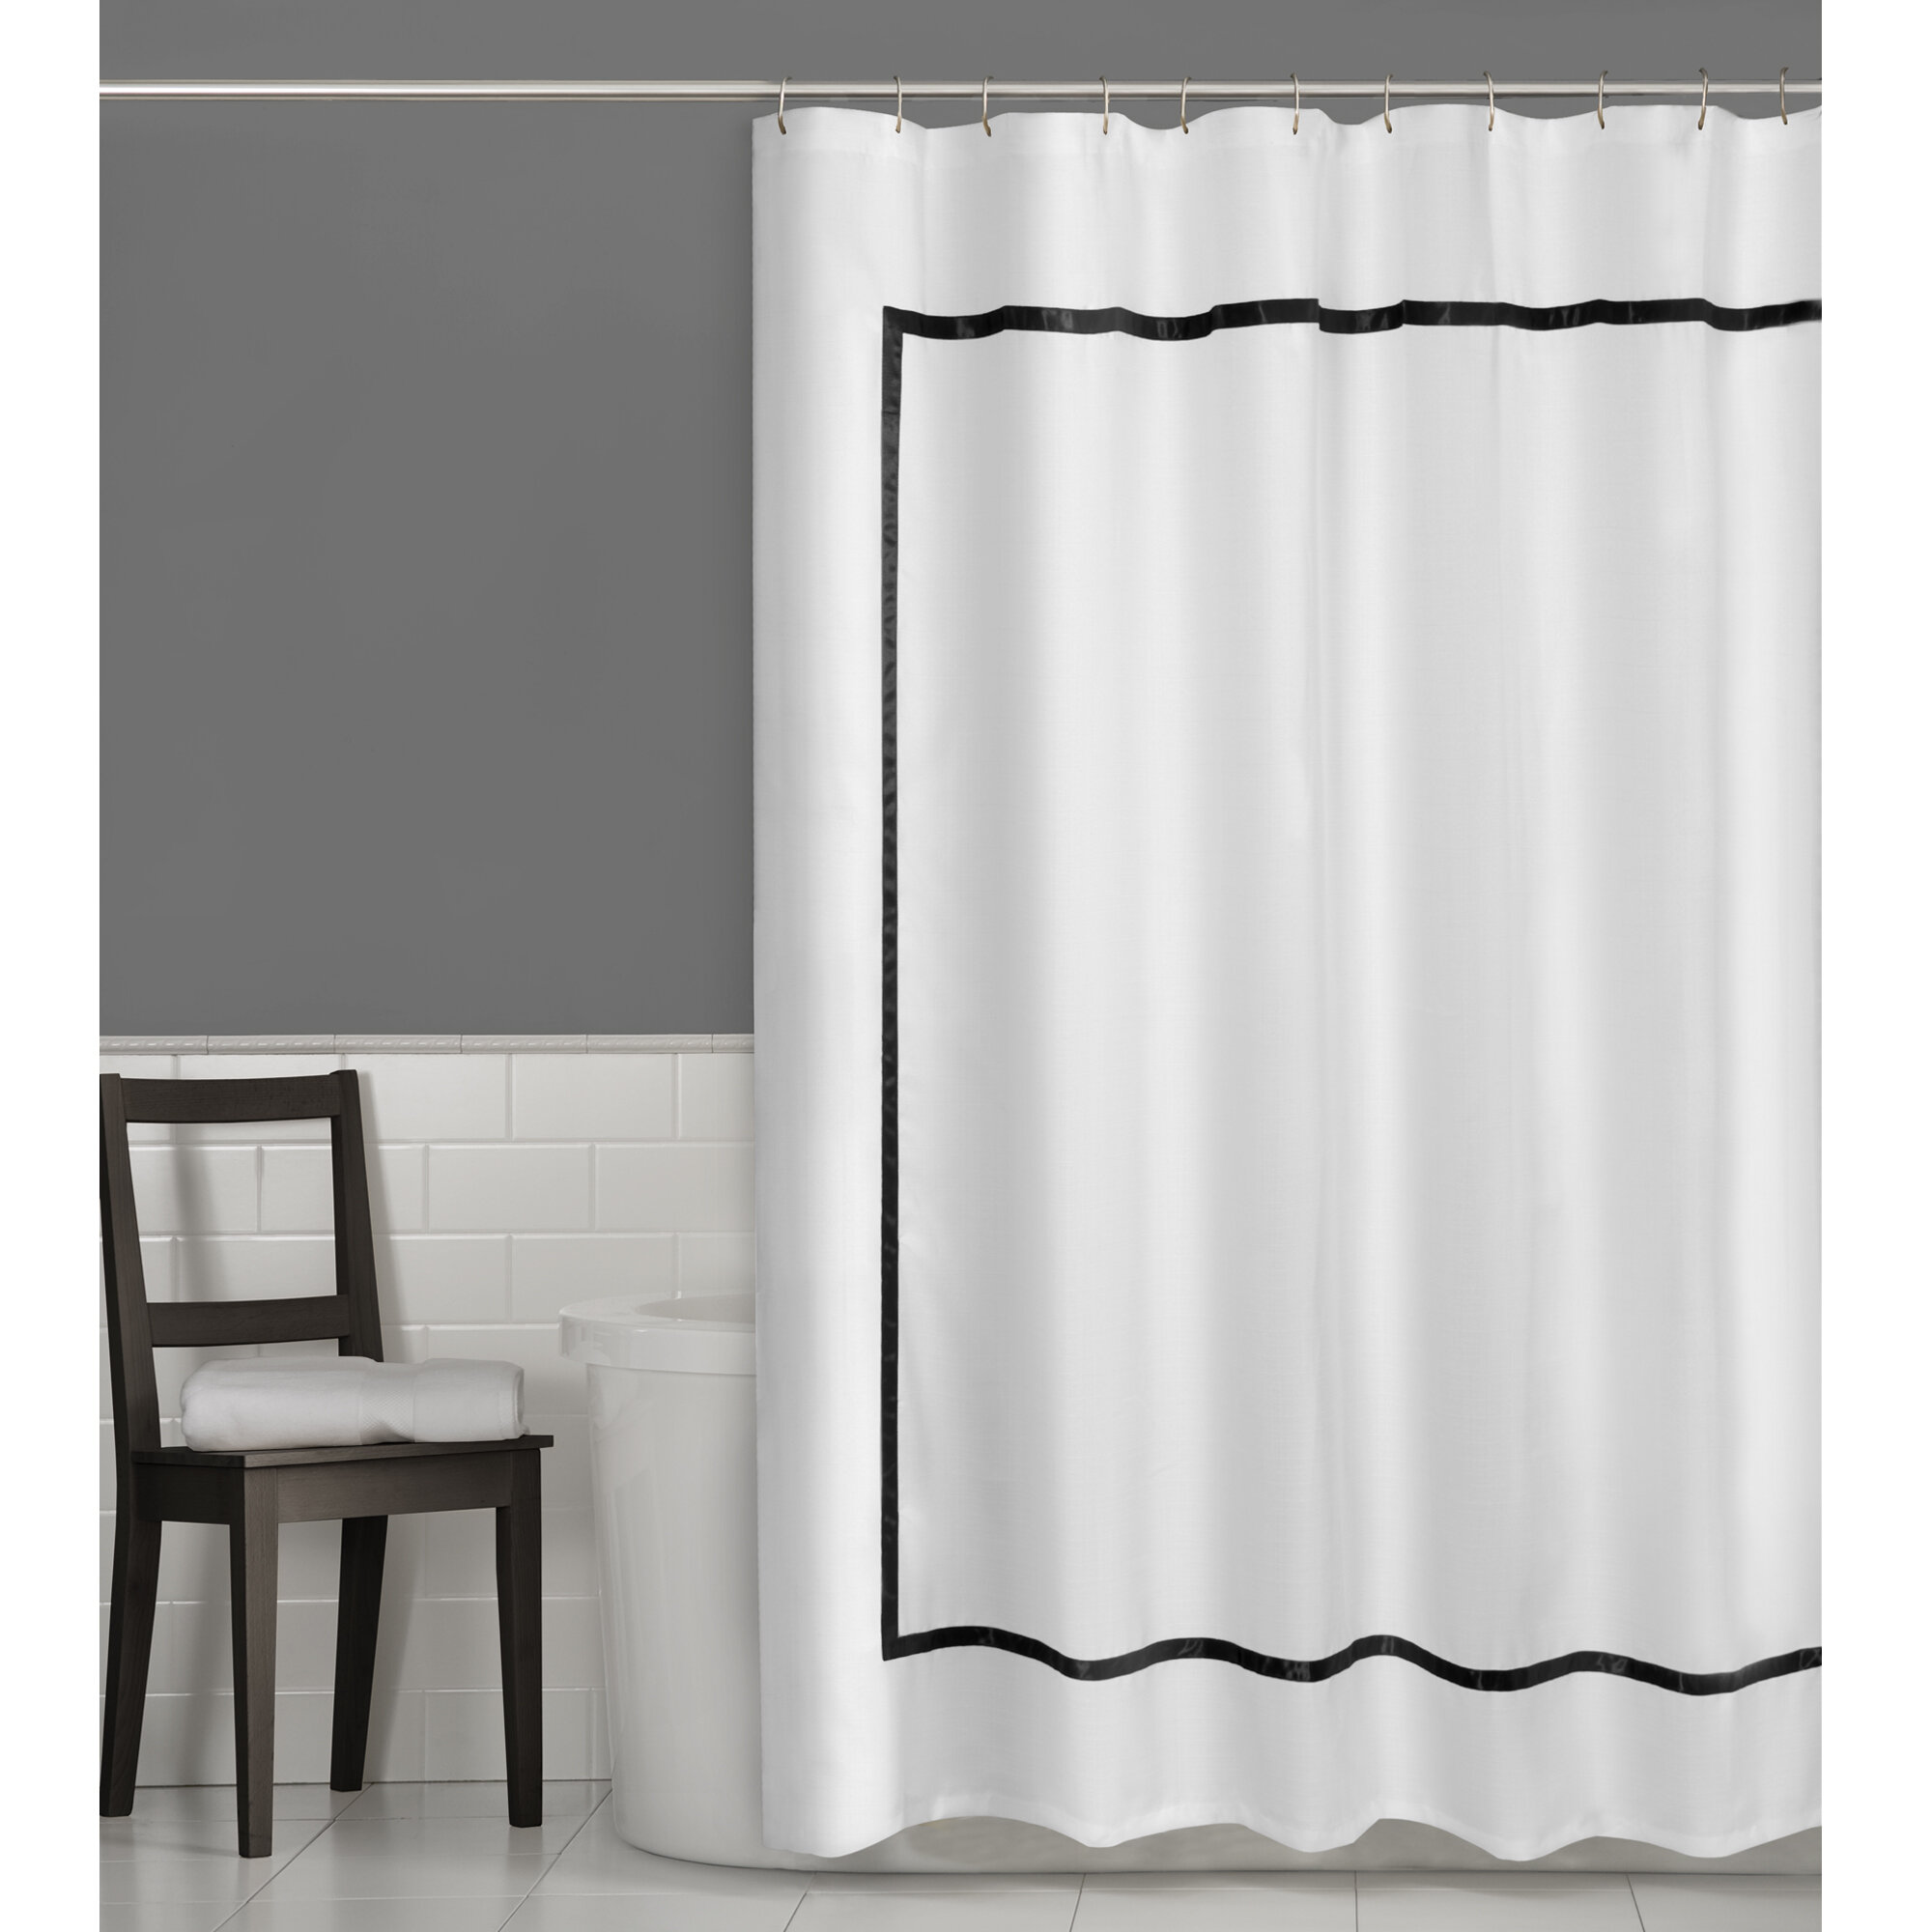 Maytex Hotel Border Shower Curtain & Reviews | Wayfair